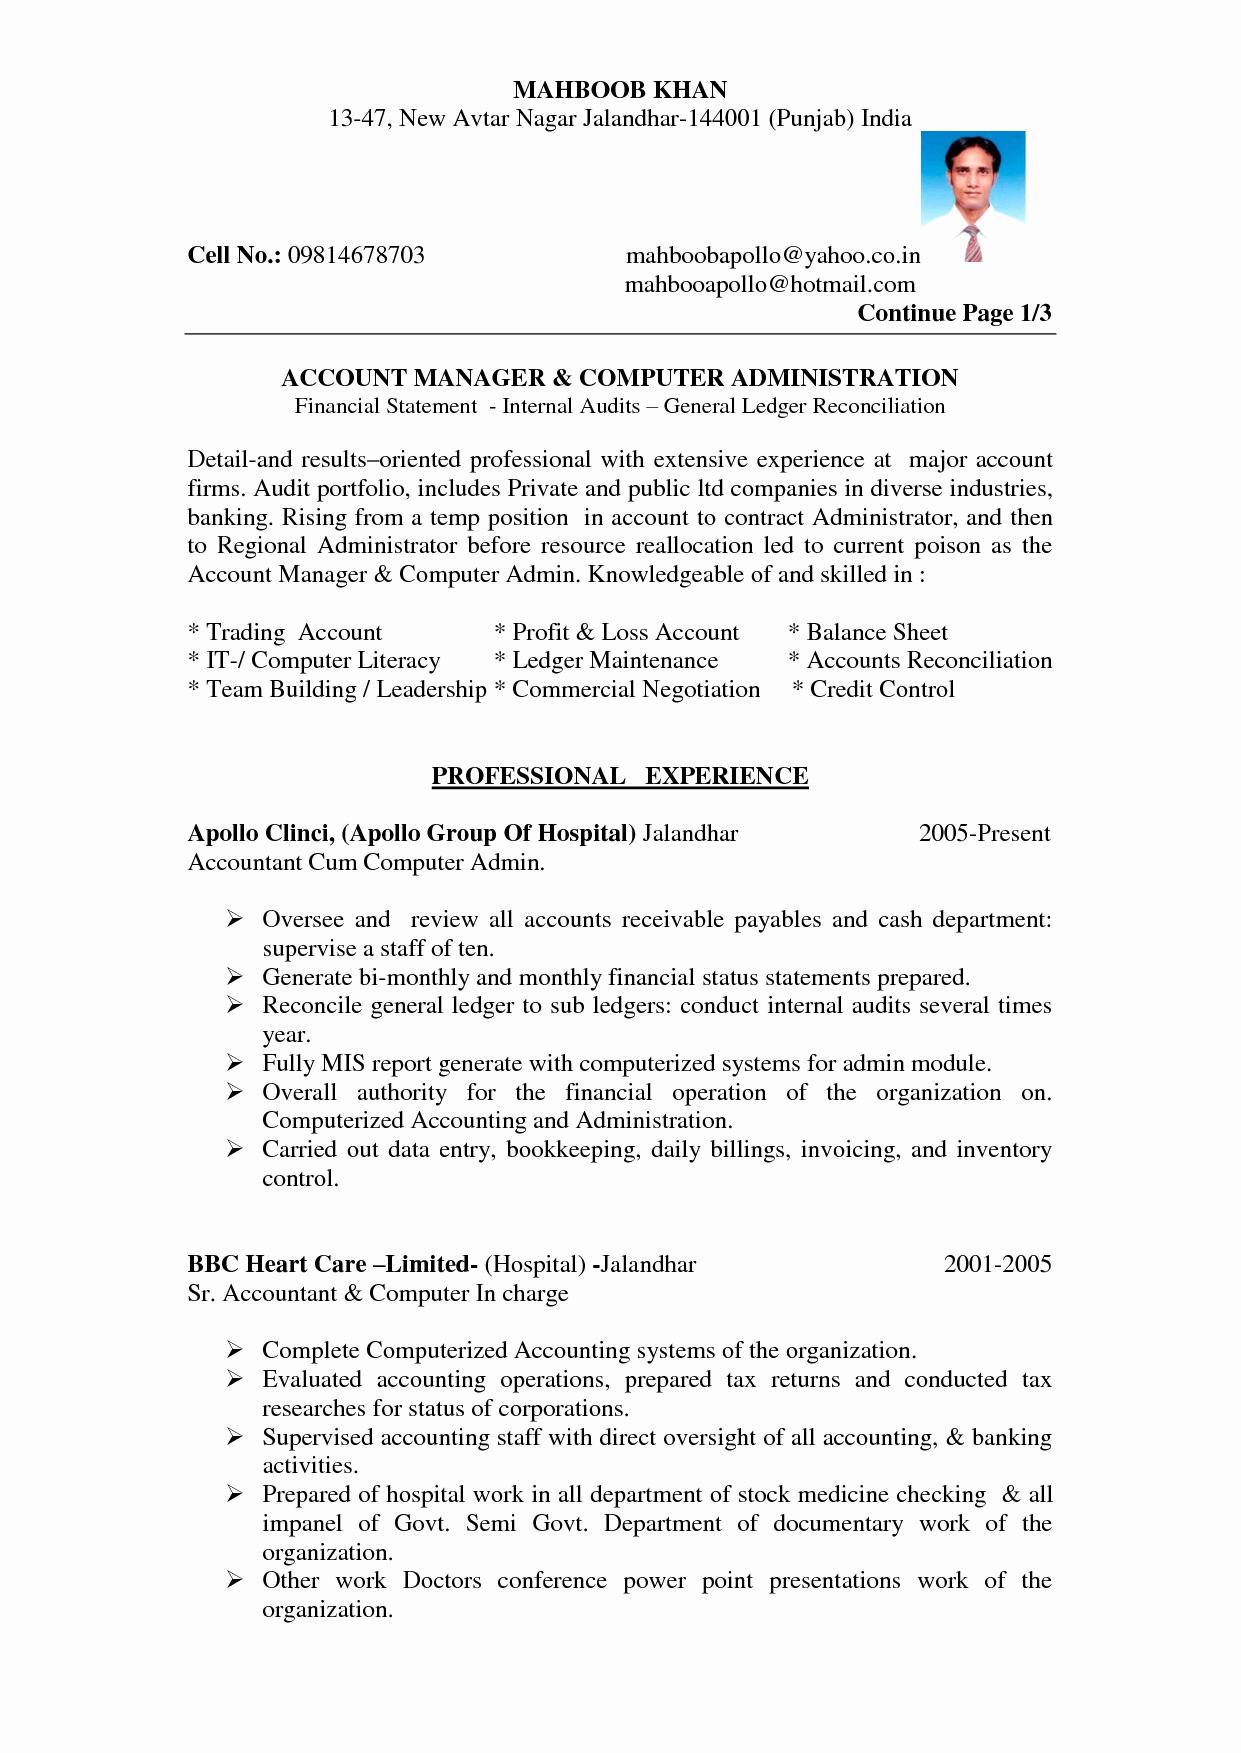 Resume format for Bank Jobs In India Sidemcicek